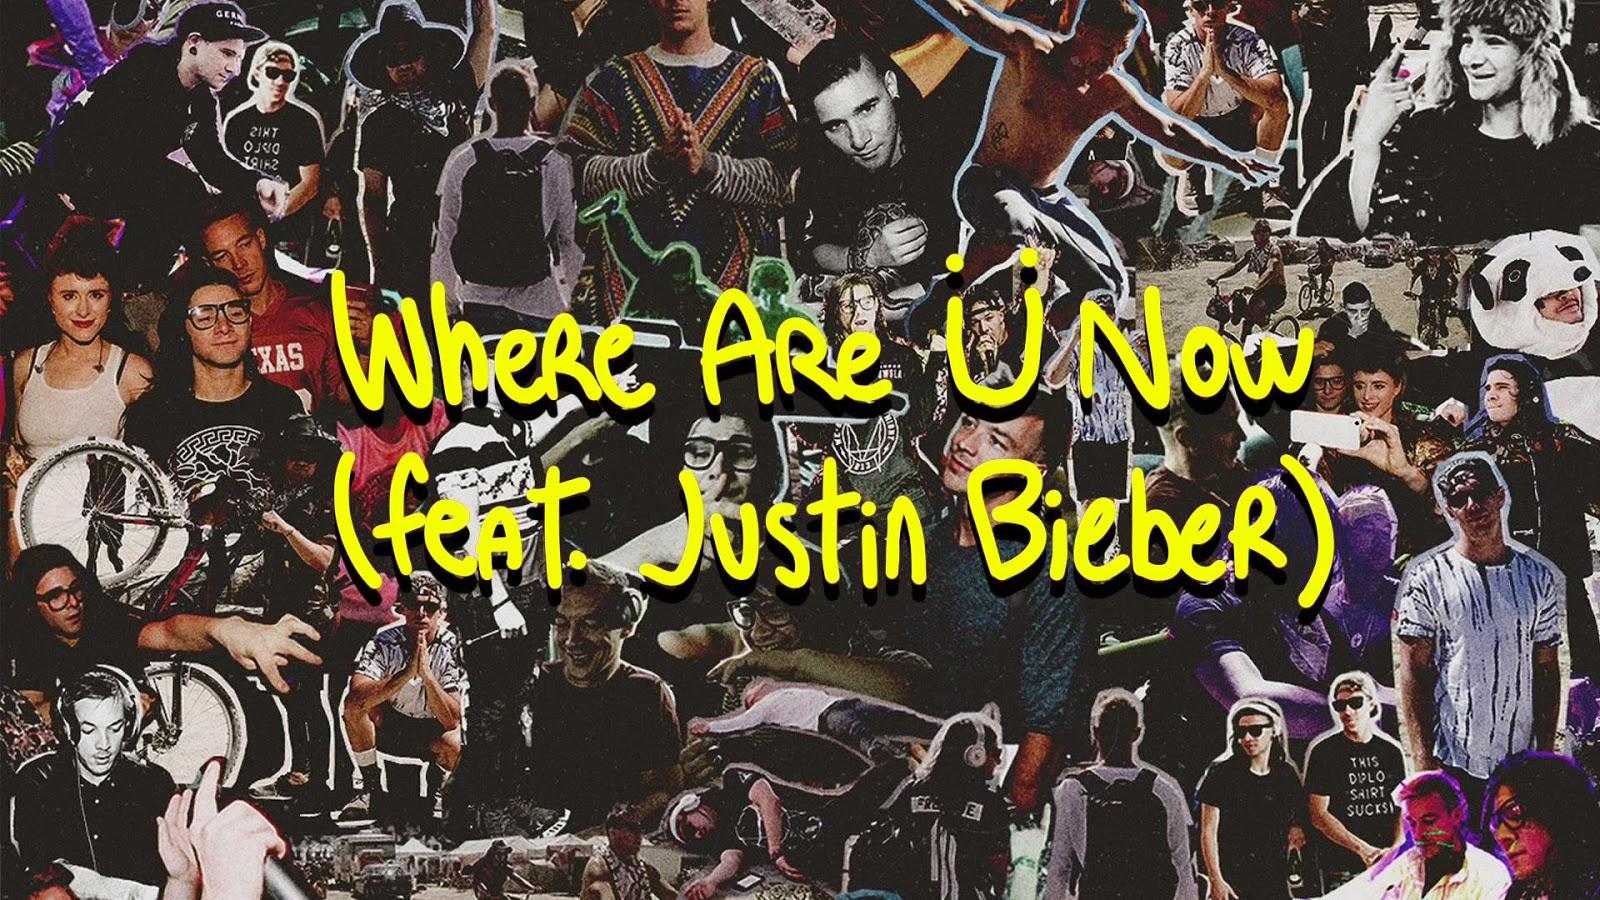 Jack-U-Where-Are-U-Now